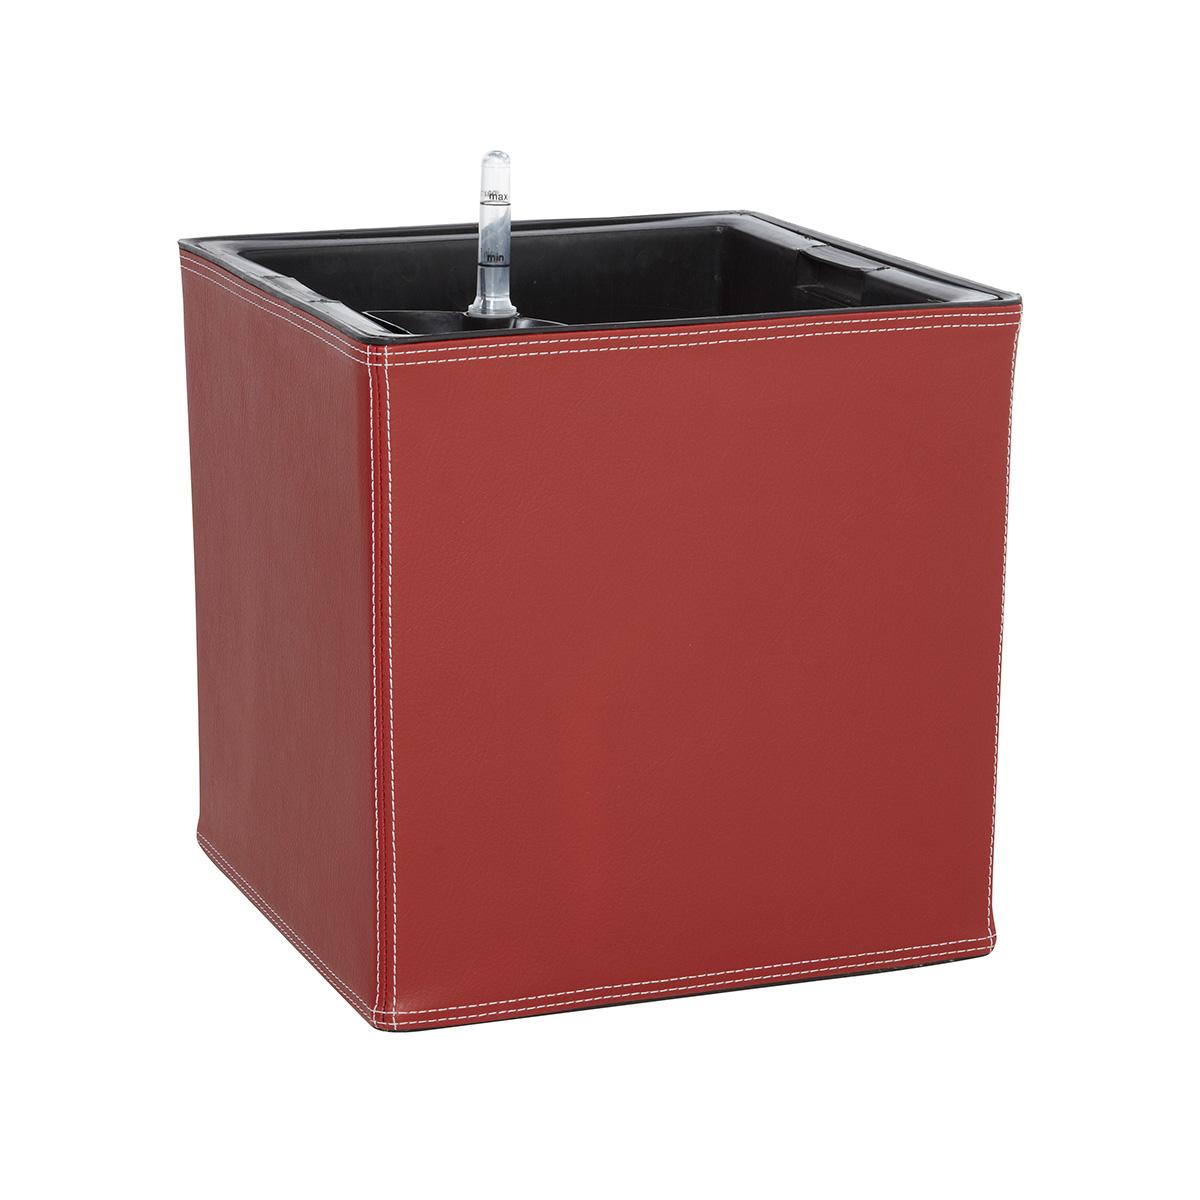 luxury collection pflanzk bel 31x31x31cm leder optik f r innen bew sserungssystem rot. Black Bedroom Furniture Sets. Home Design Ideas